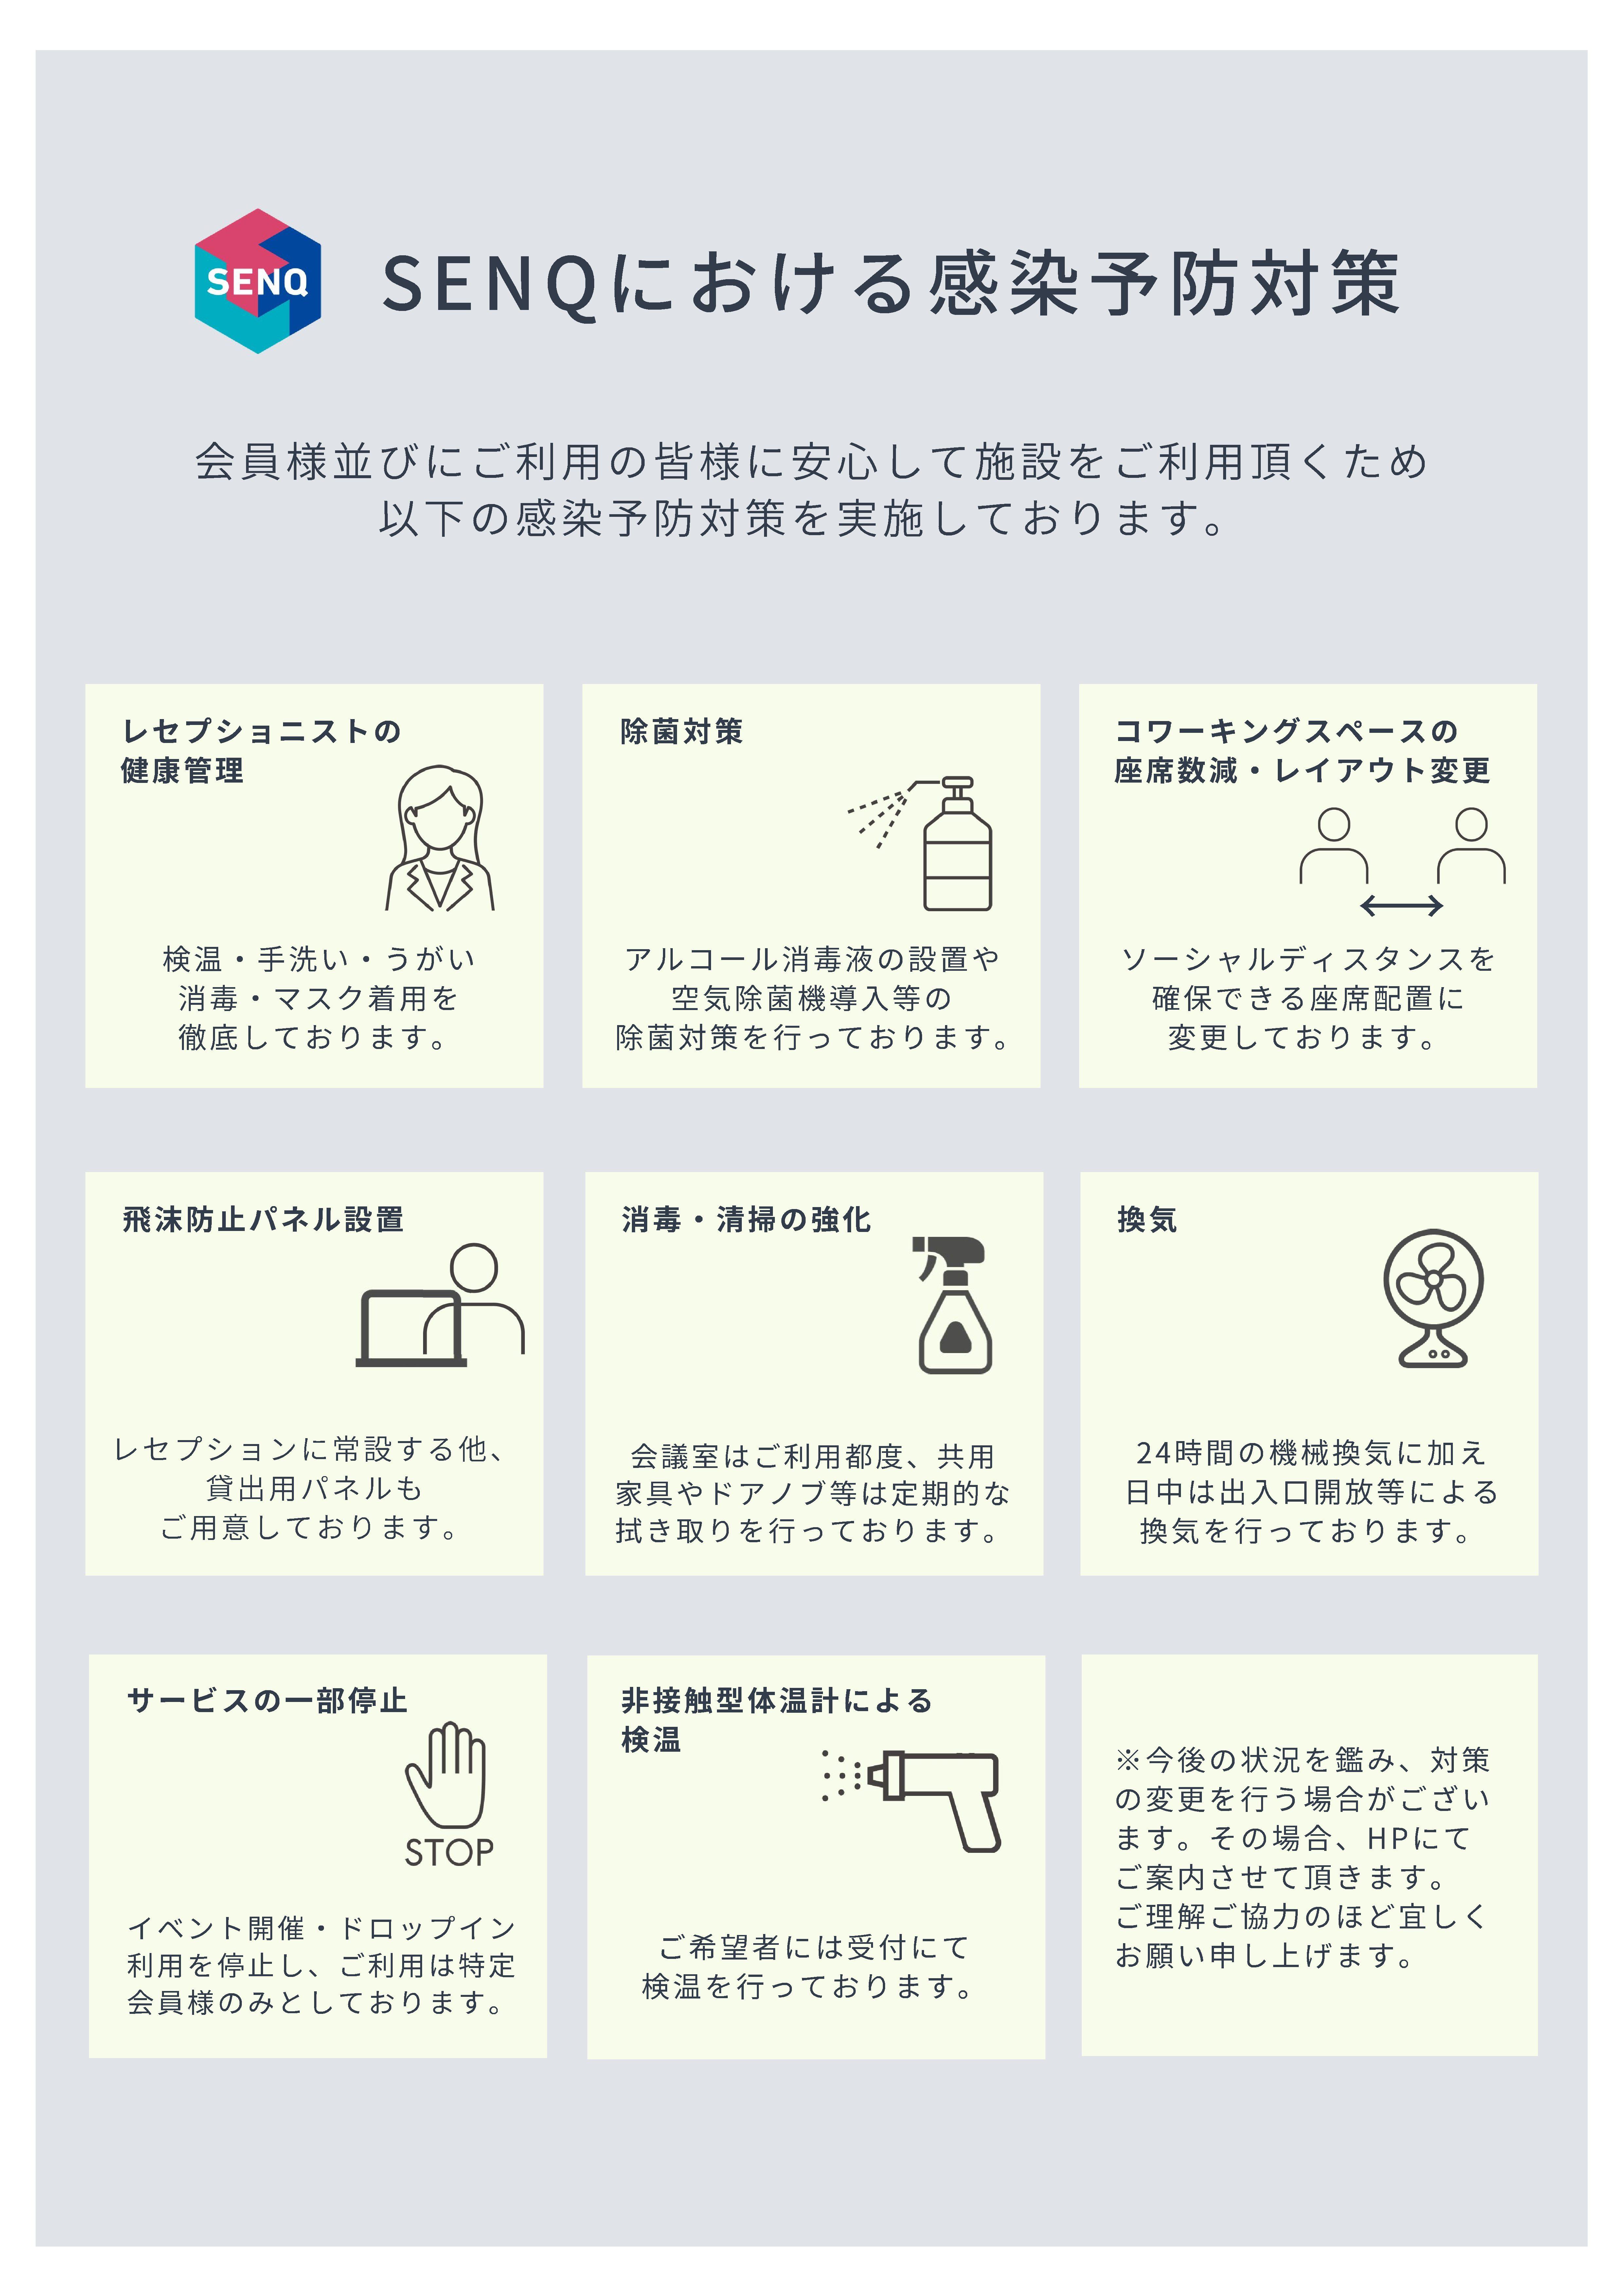 SENQコロナ対策 (3)